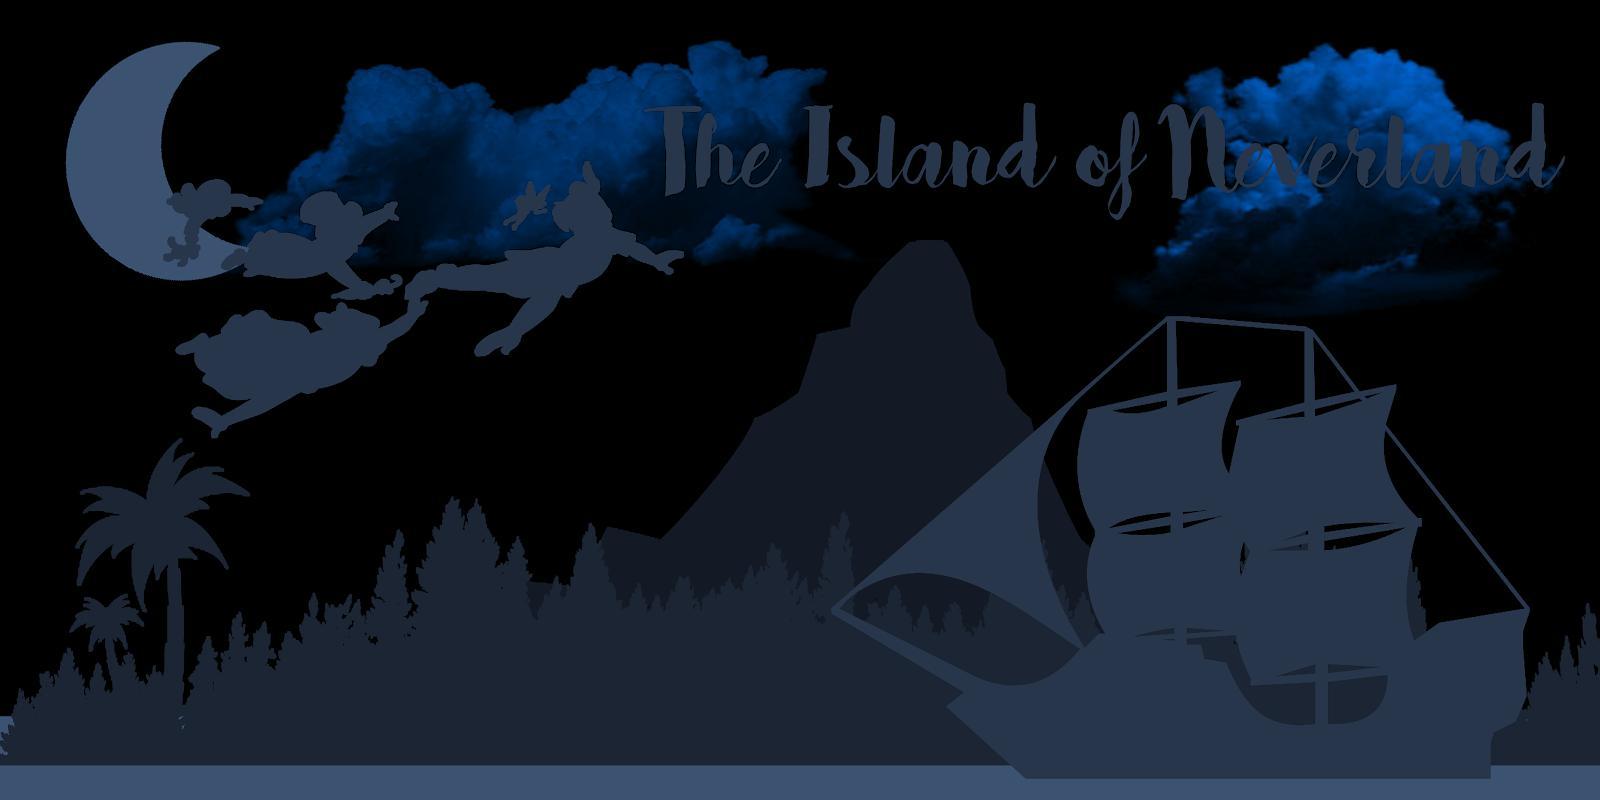 Logo The Island of Neverland